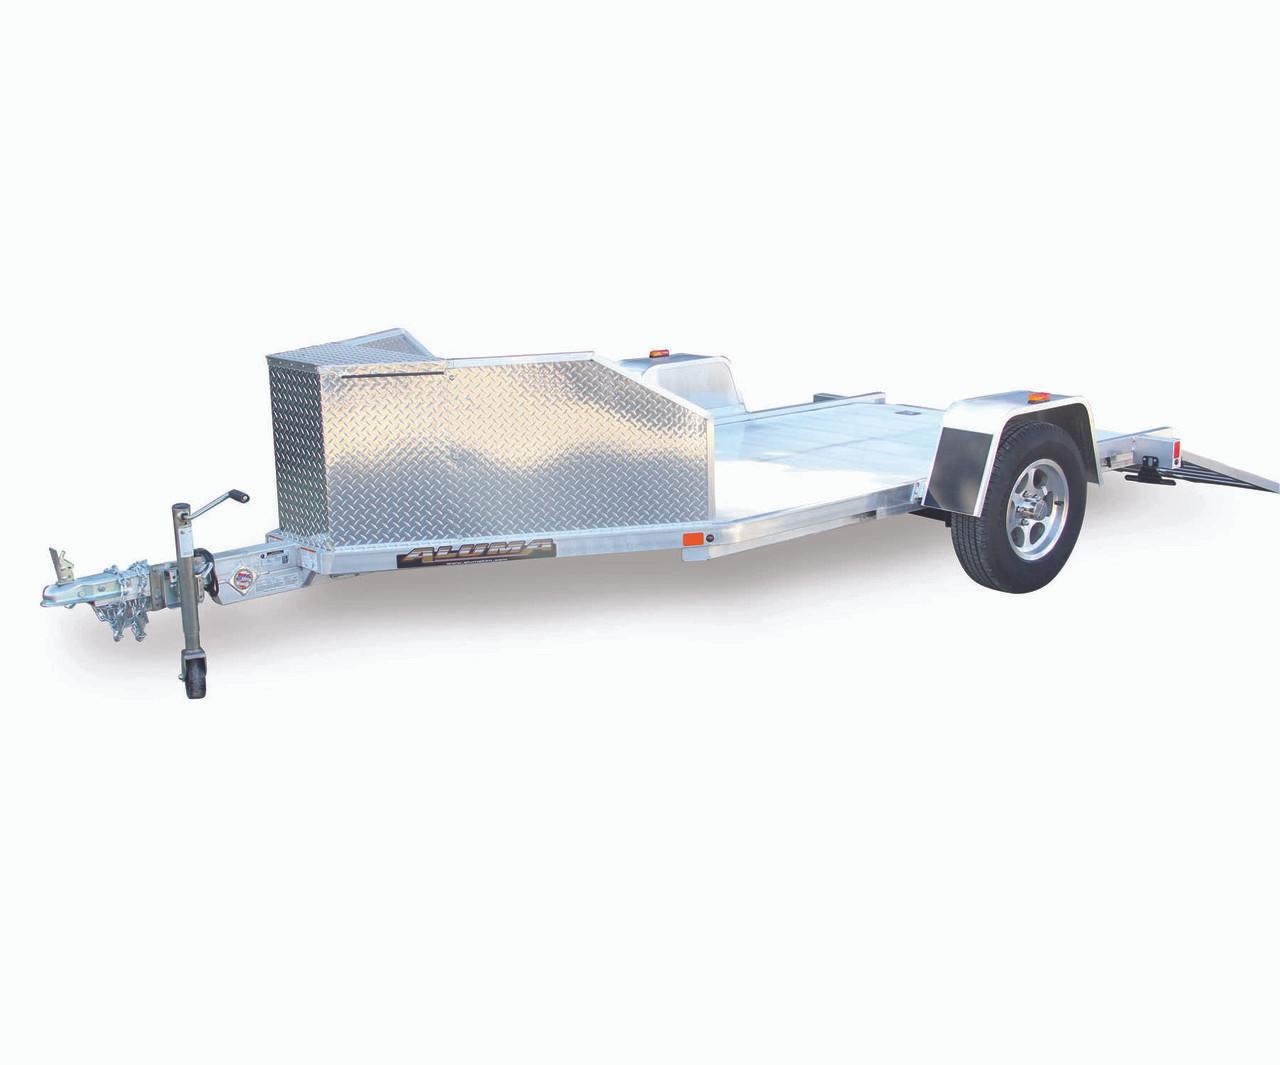 Altk1 63 X 137 Aluminum Trike Trailer With Ramp Croft Aluma Wiring Diagram